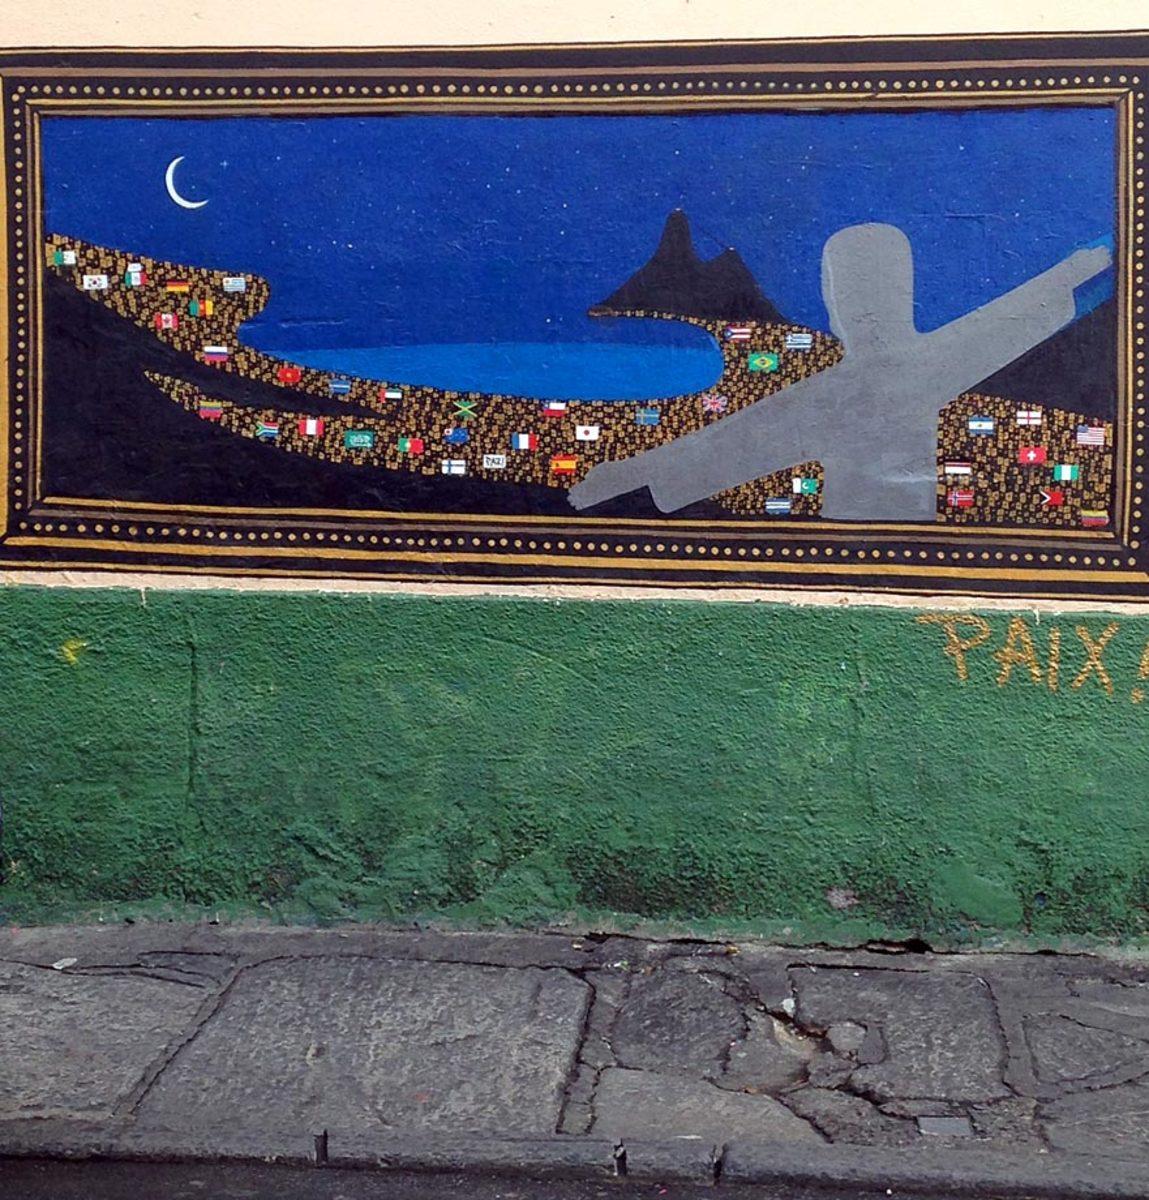 soccer-graffiti-mural-rio-IMG_8498.jpg